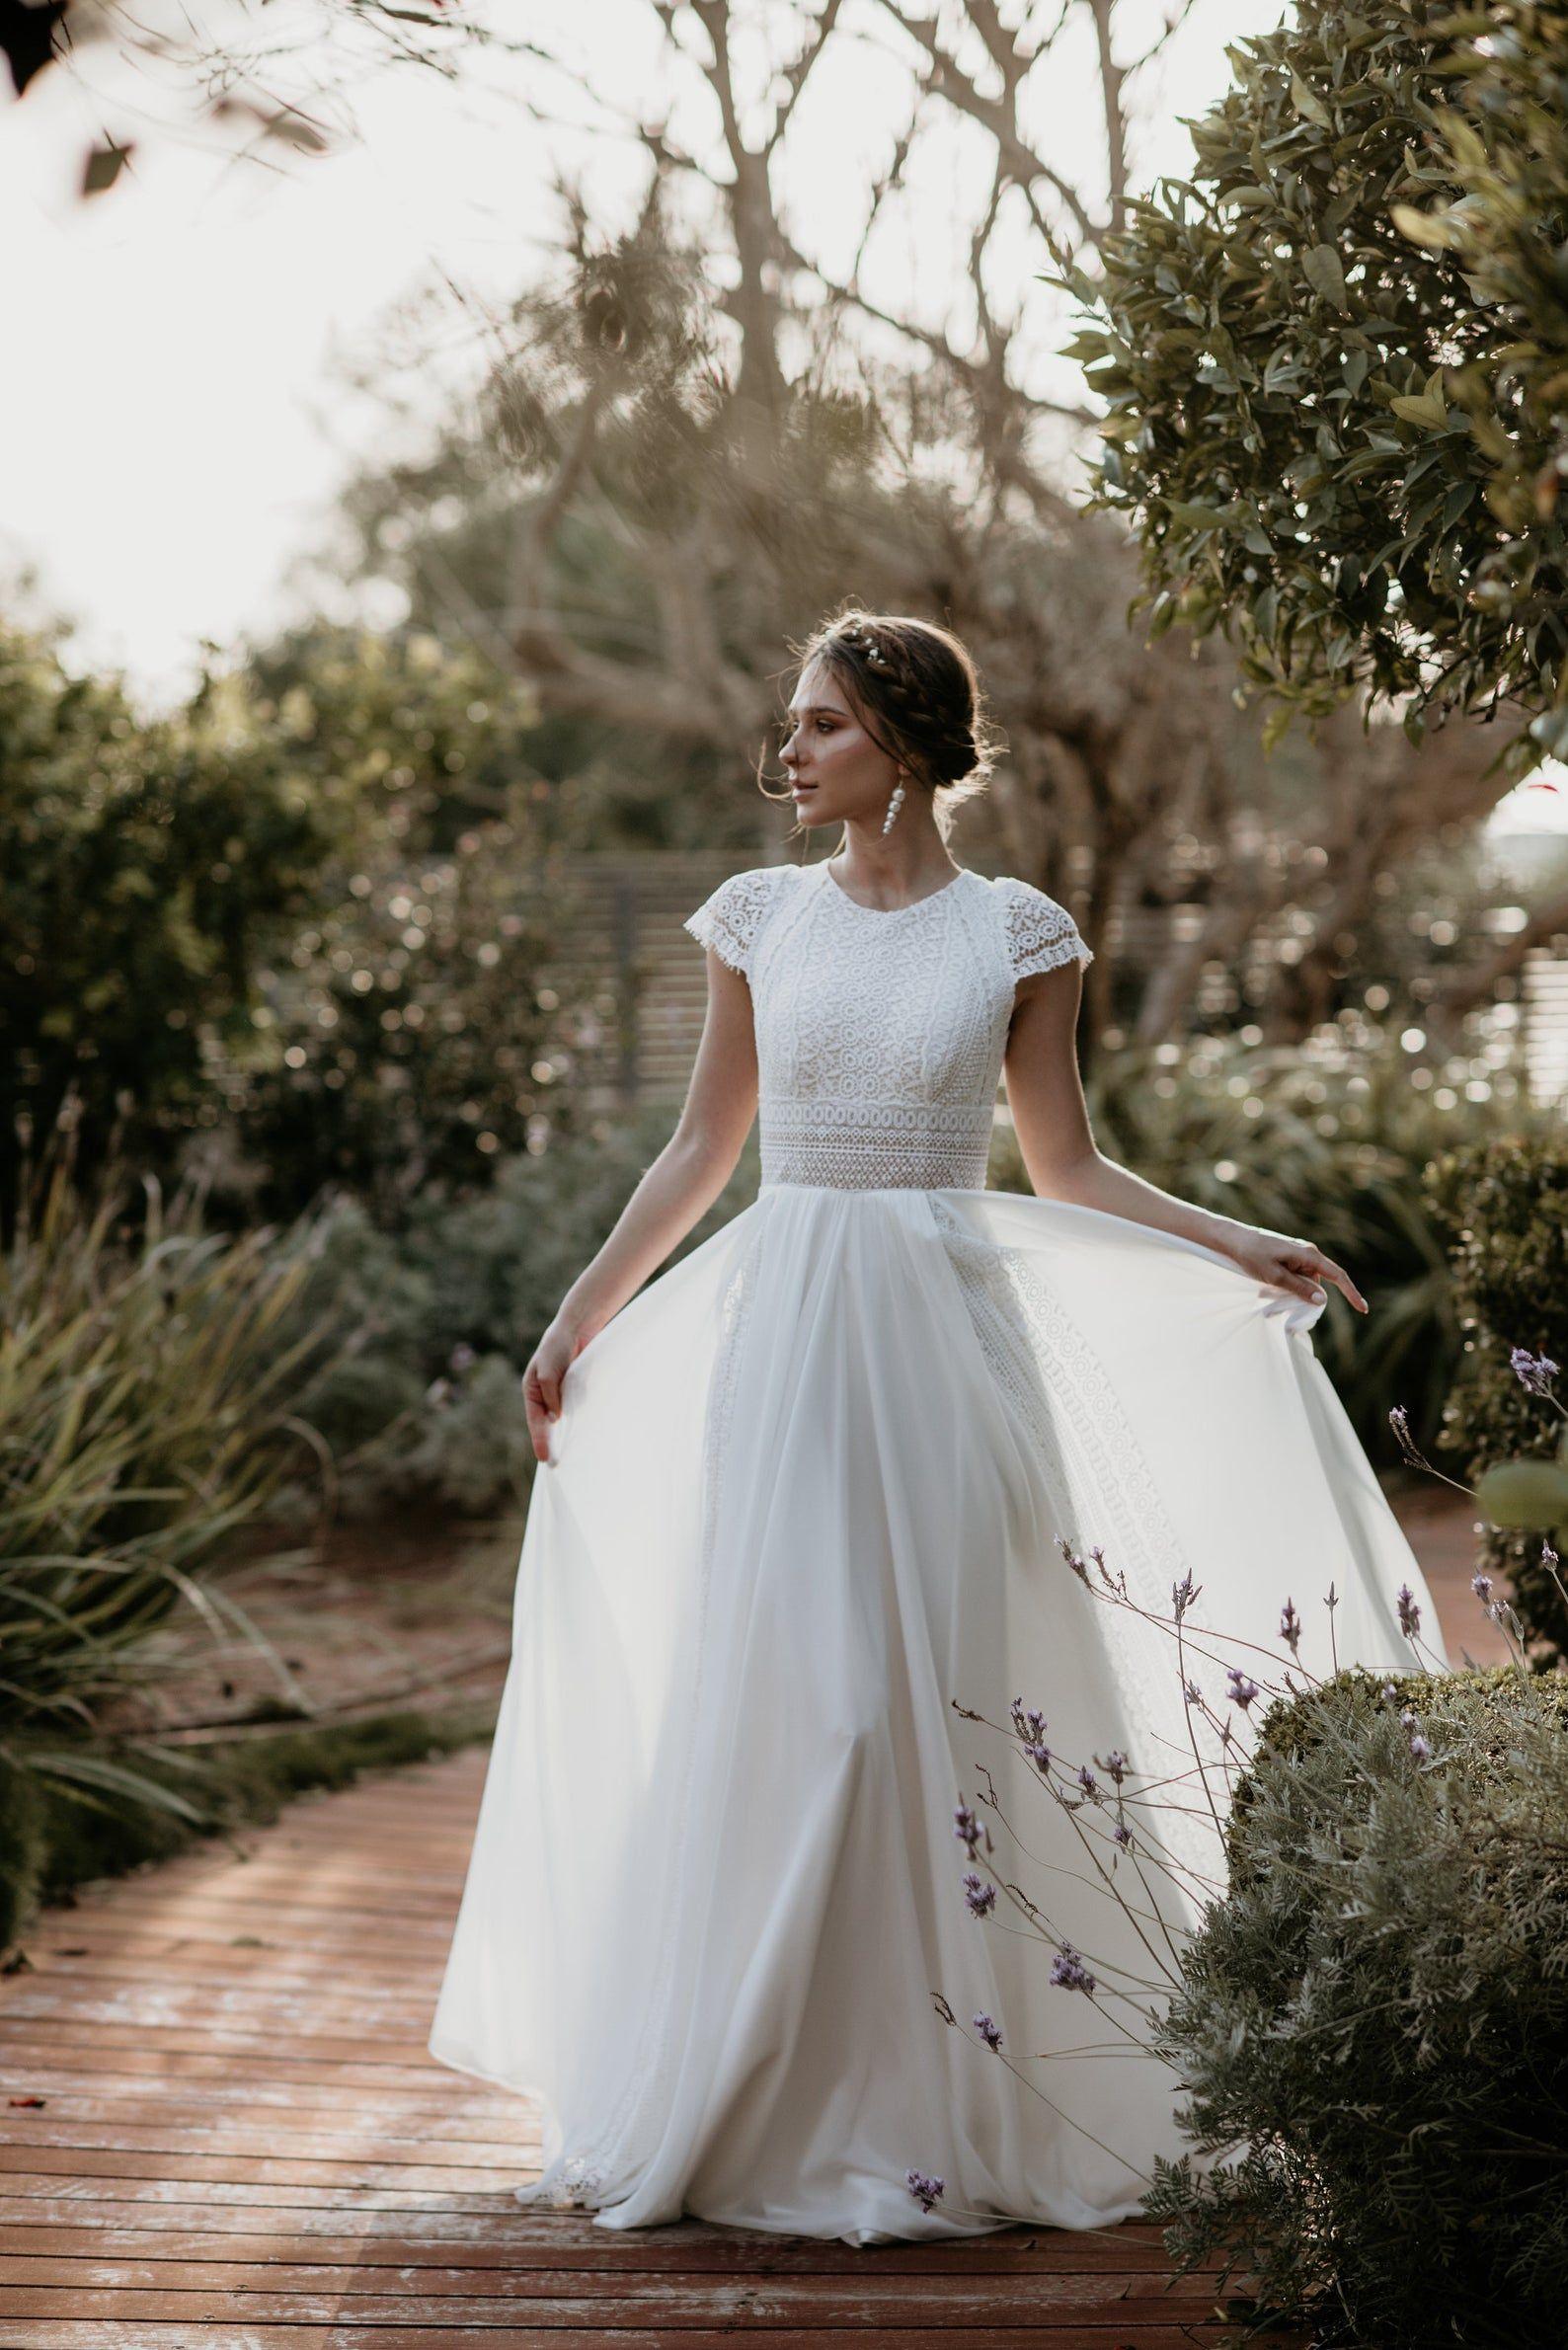 Short Sleeve Womens Dress Vintage Ivory Inspirational Boho Etsy Wedding Dresses Wedding Wedding Dresses Vintage [ 2380 x 1588 Pixel ]